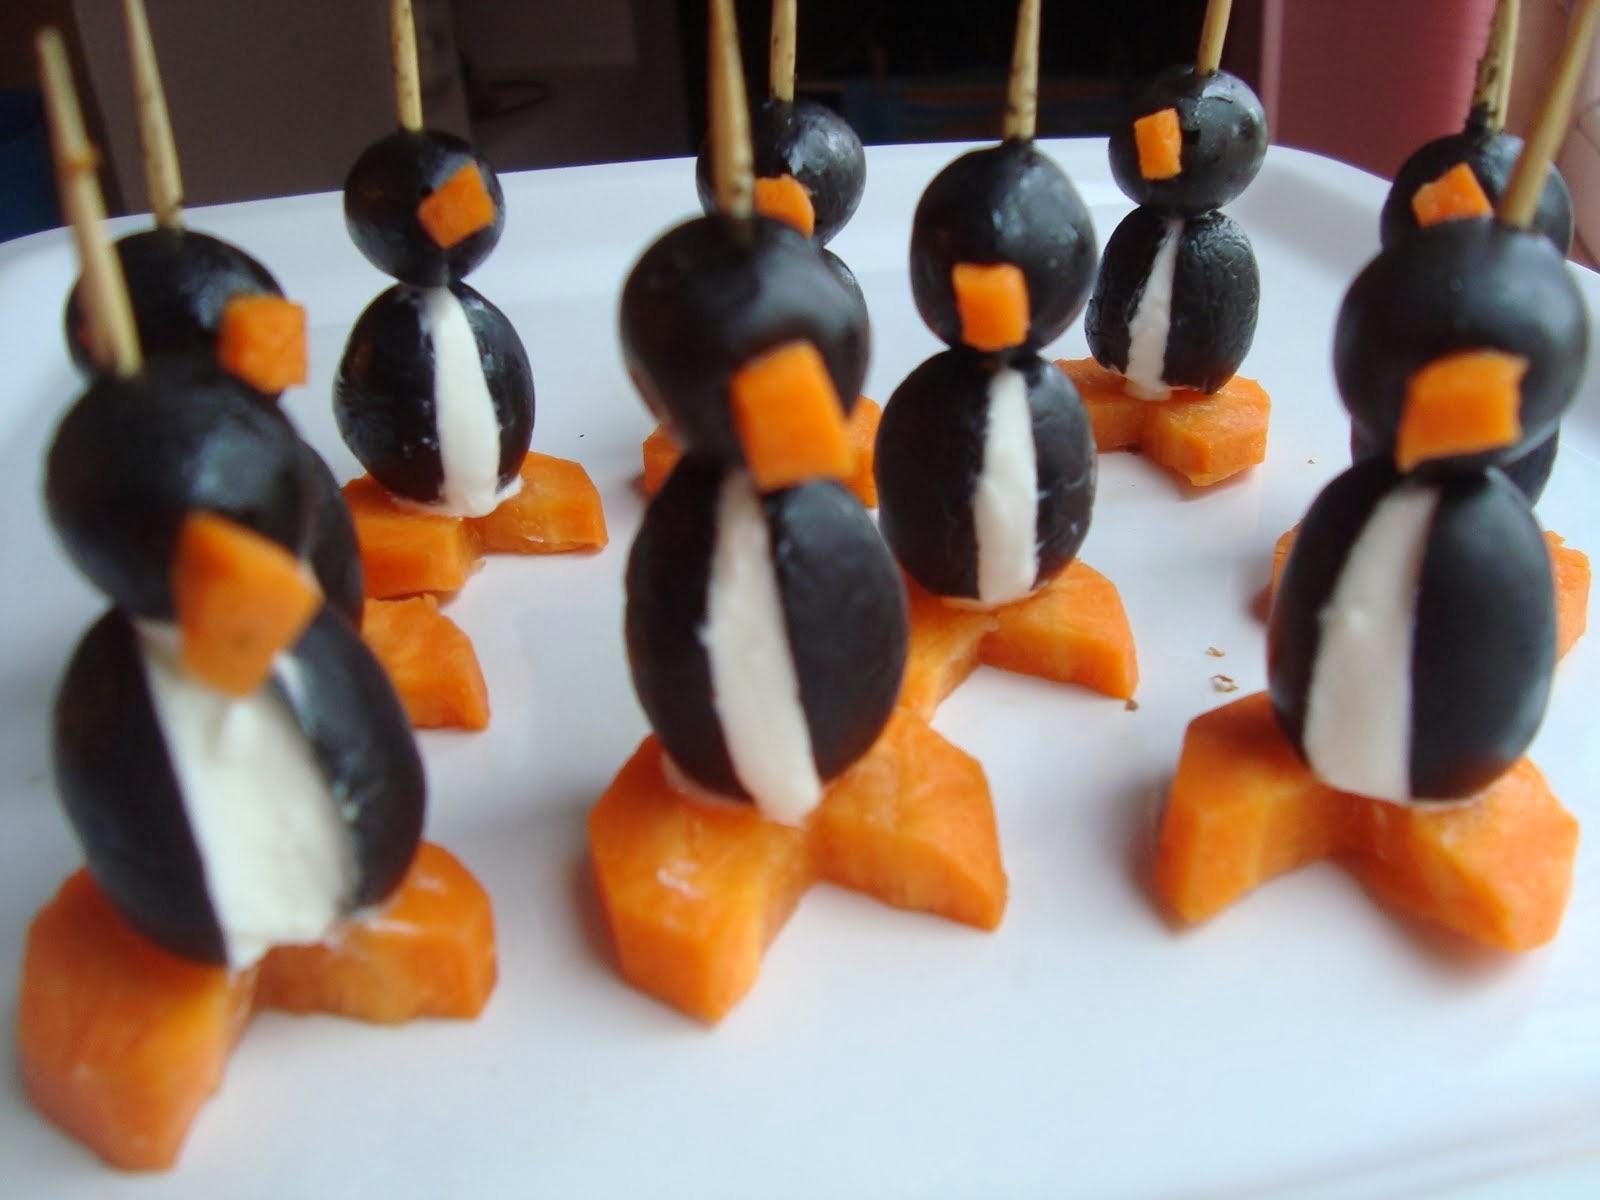 http://www.caietulcuretete.com/2010/10/masline-umplute-pinguini.html